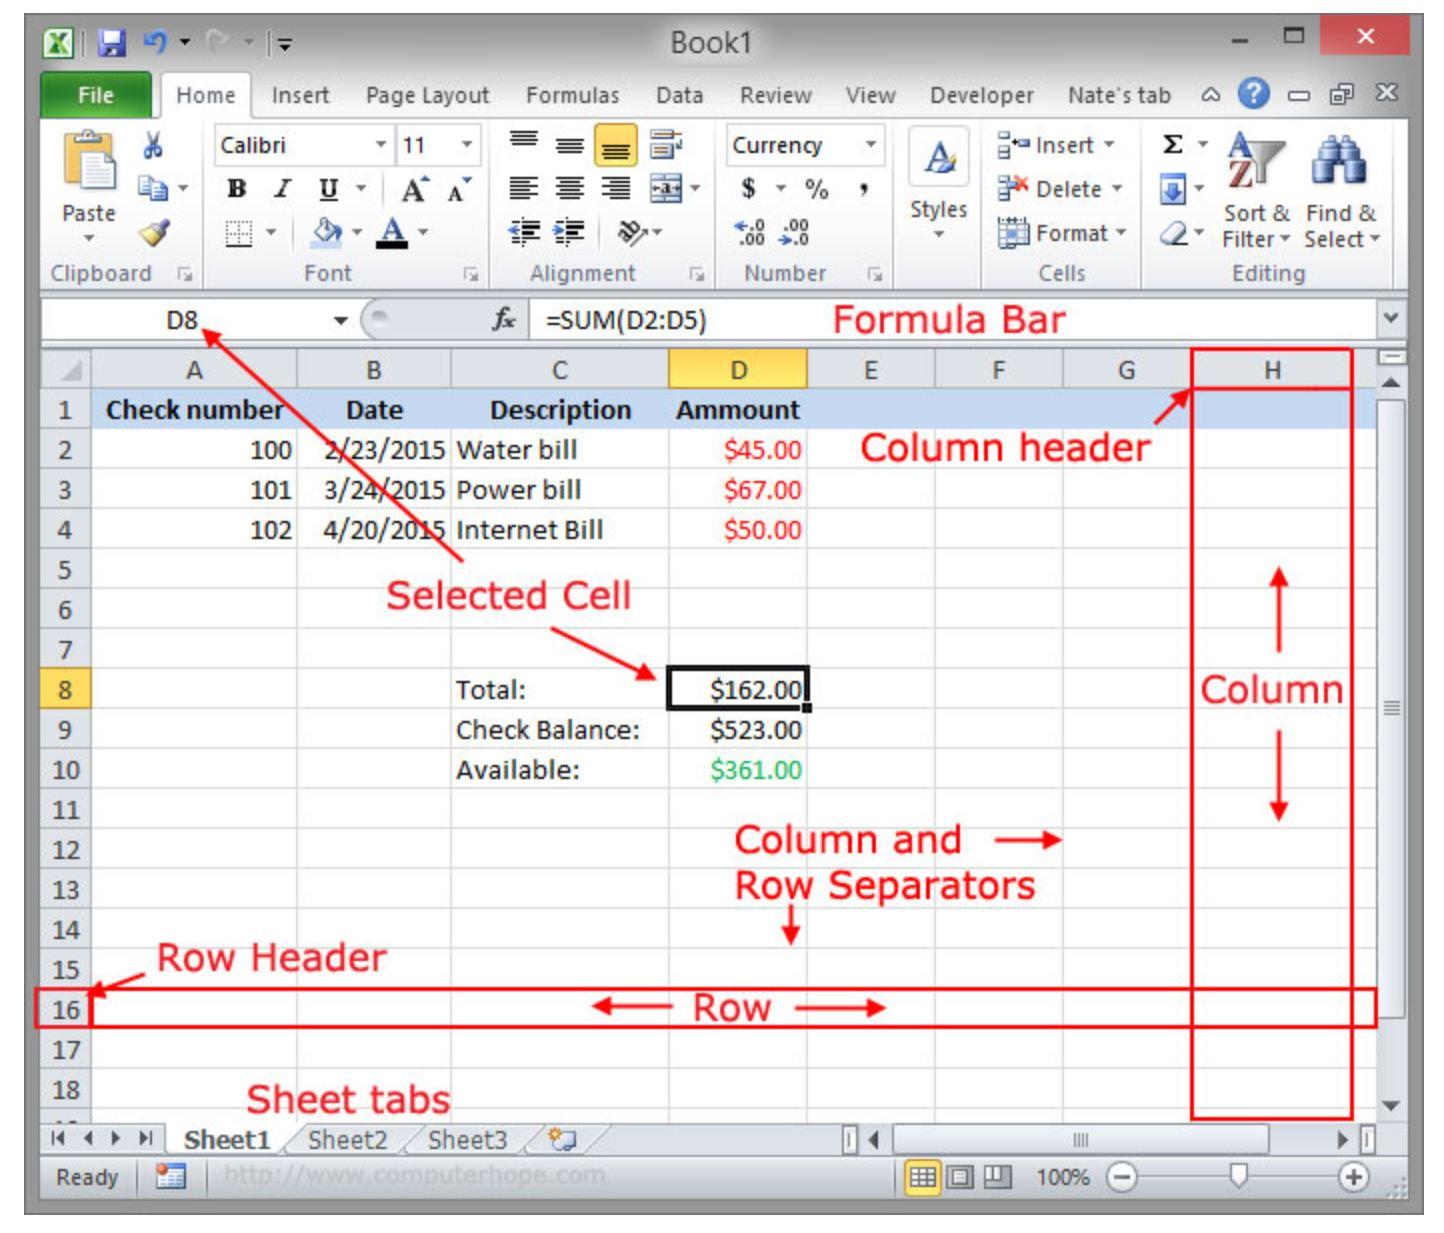 Excel Basics: Analyzing The Data